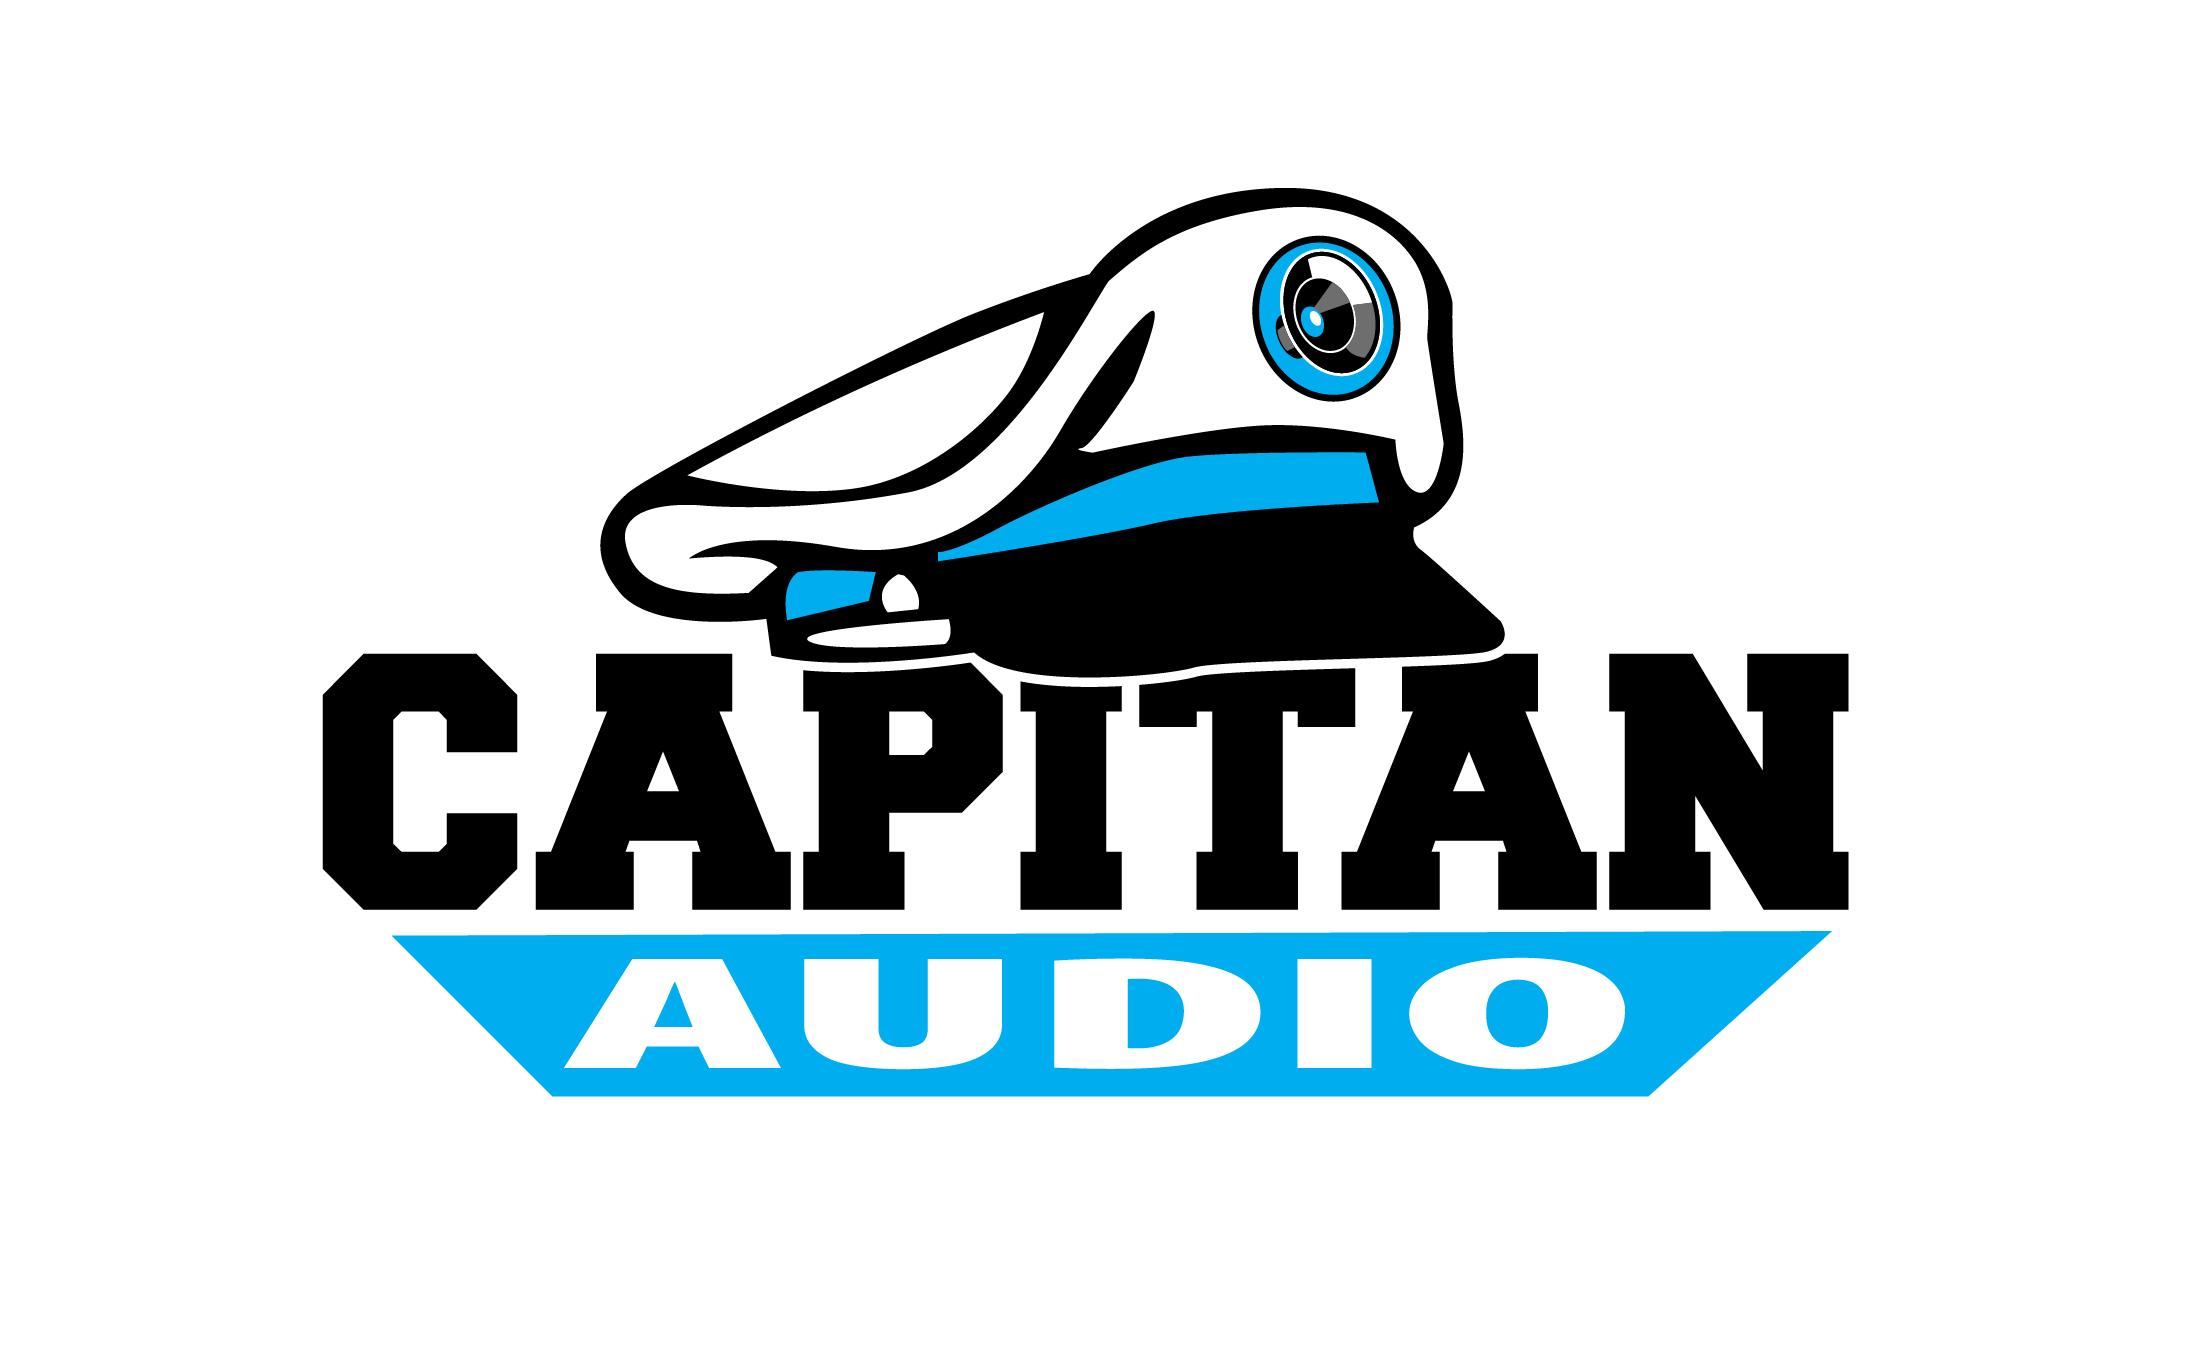 CAPITAN AUDIO